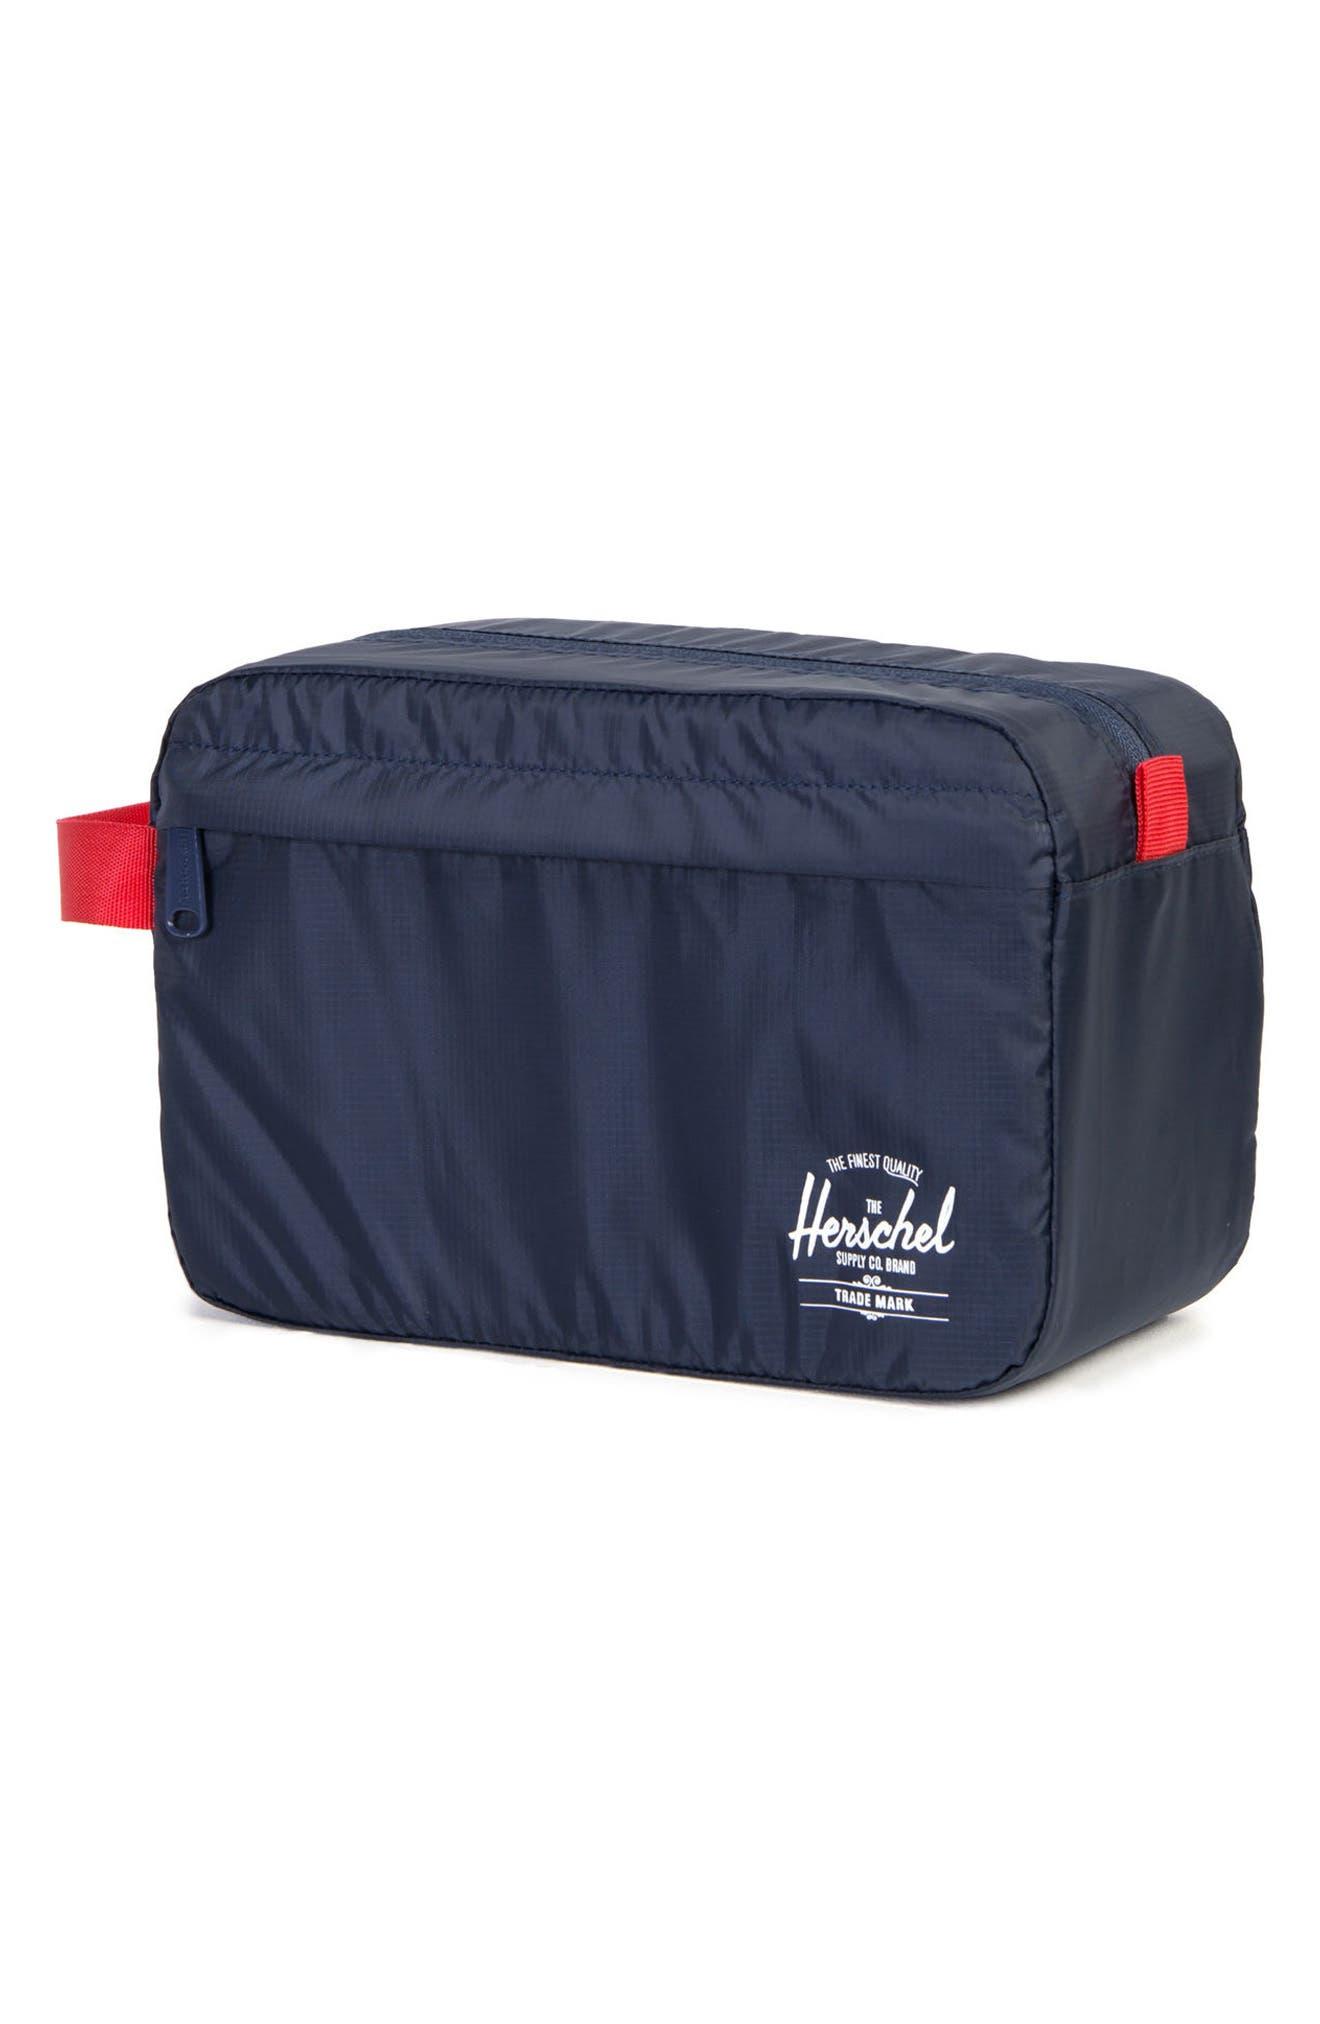 0fe7af3aa79f Dopp Kits   Travel Cases Herschel Backpacks